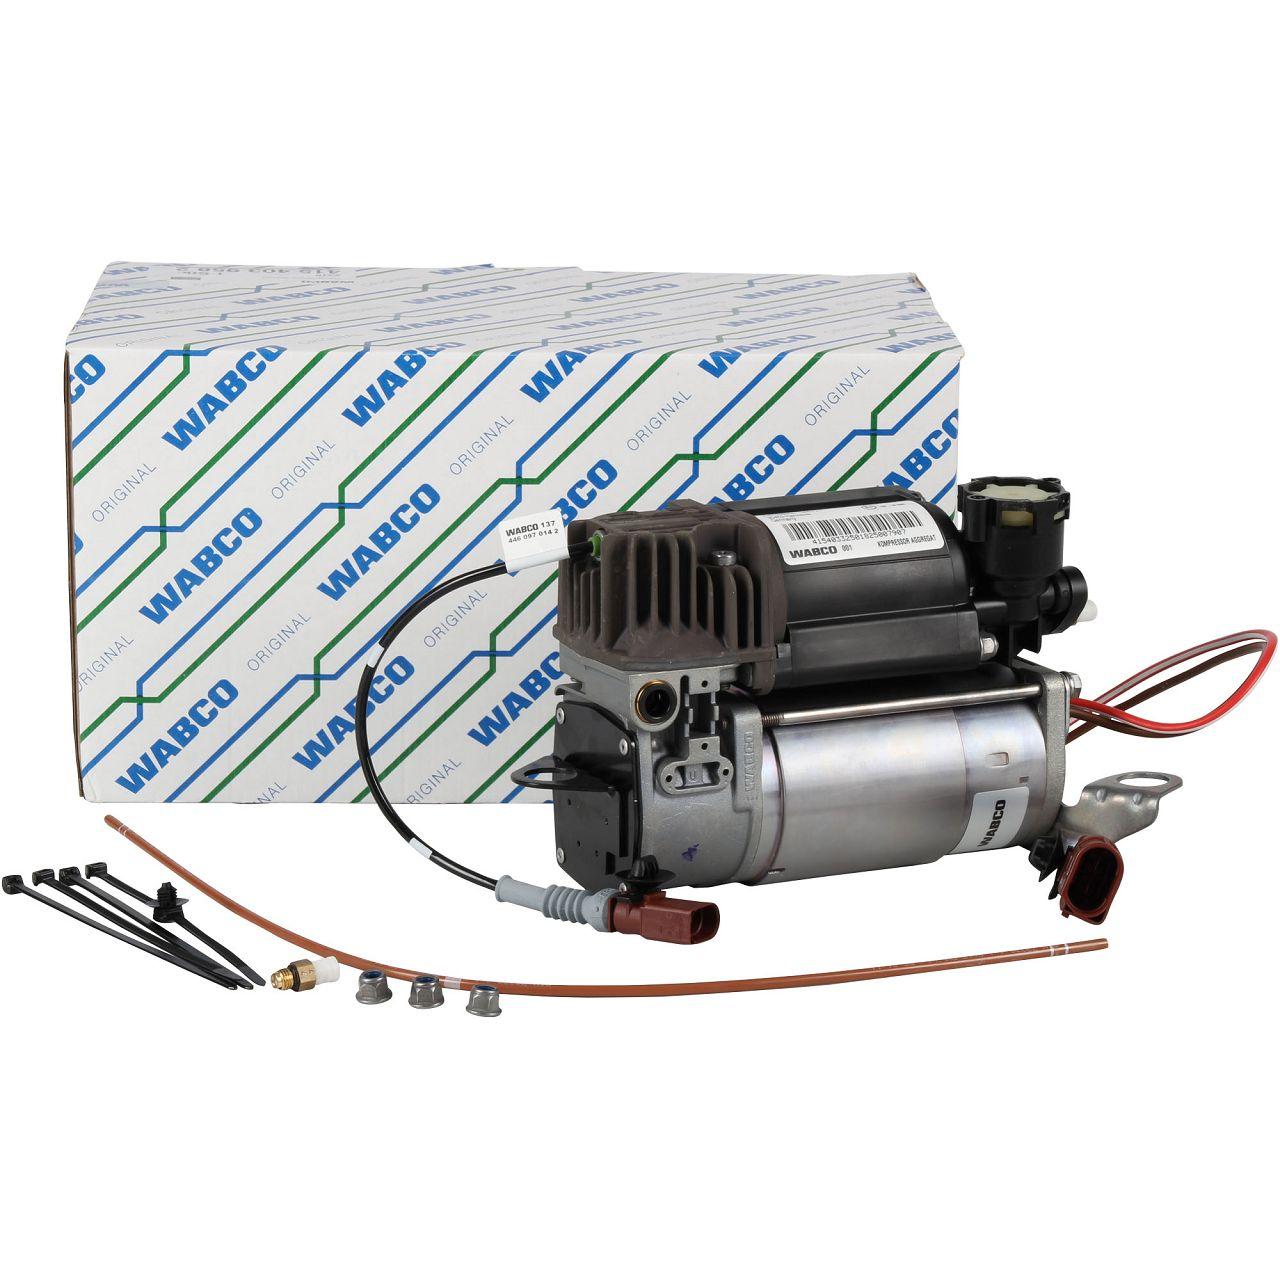 WABCO Kompressor Luftfederung Luftkompressor für AUDI A6 (C6) LIMO/AVANT/ALLROAD